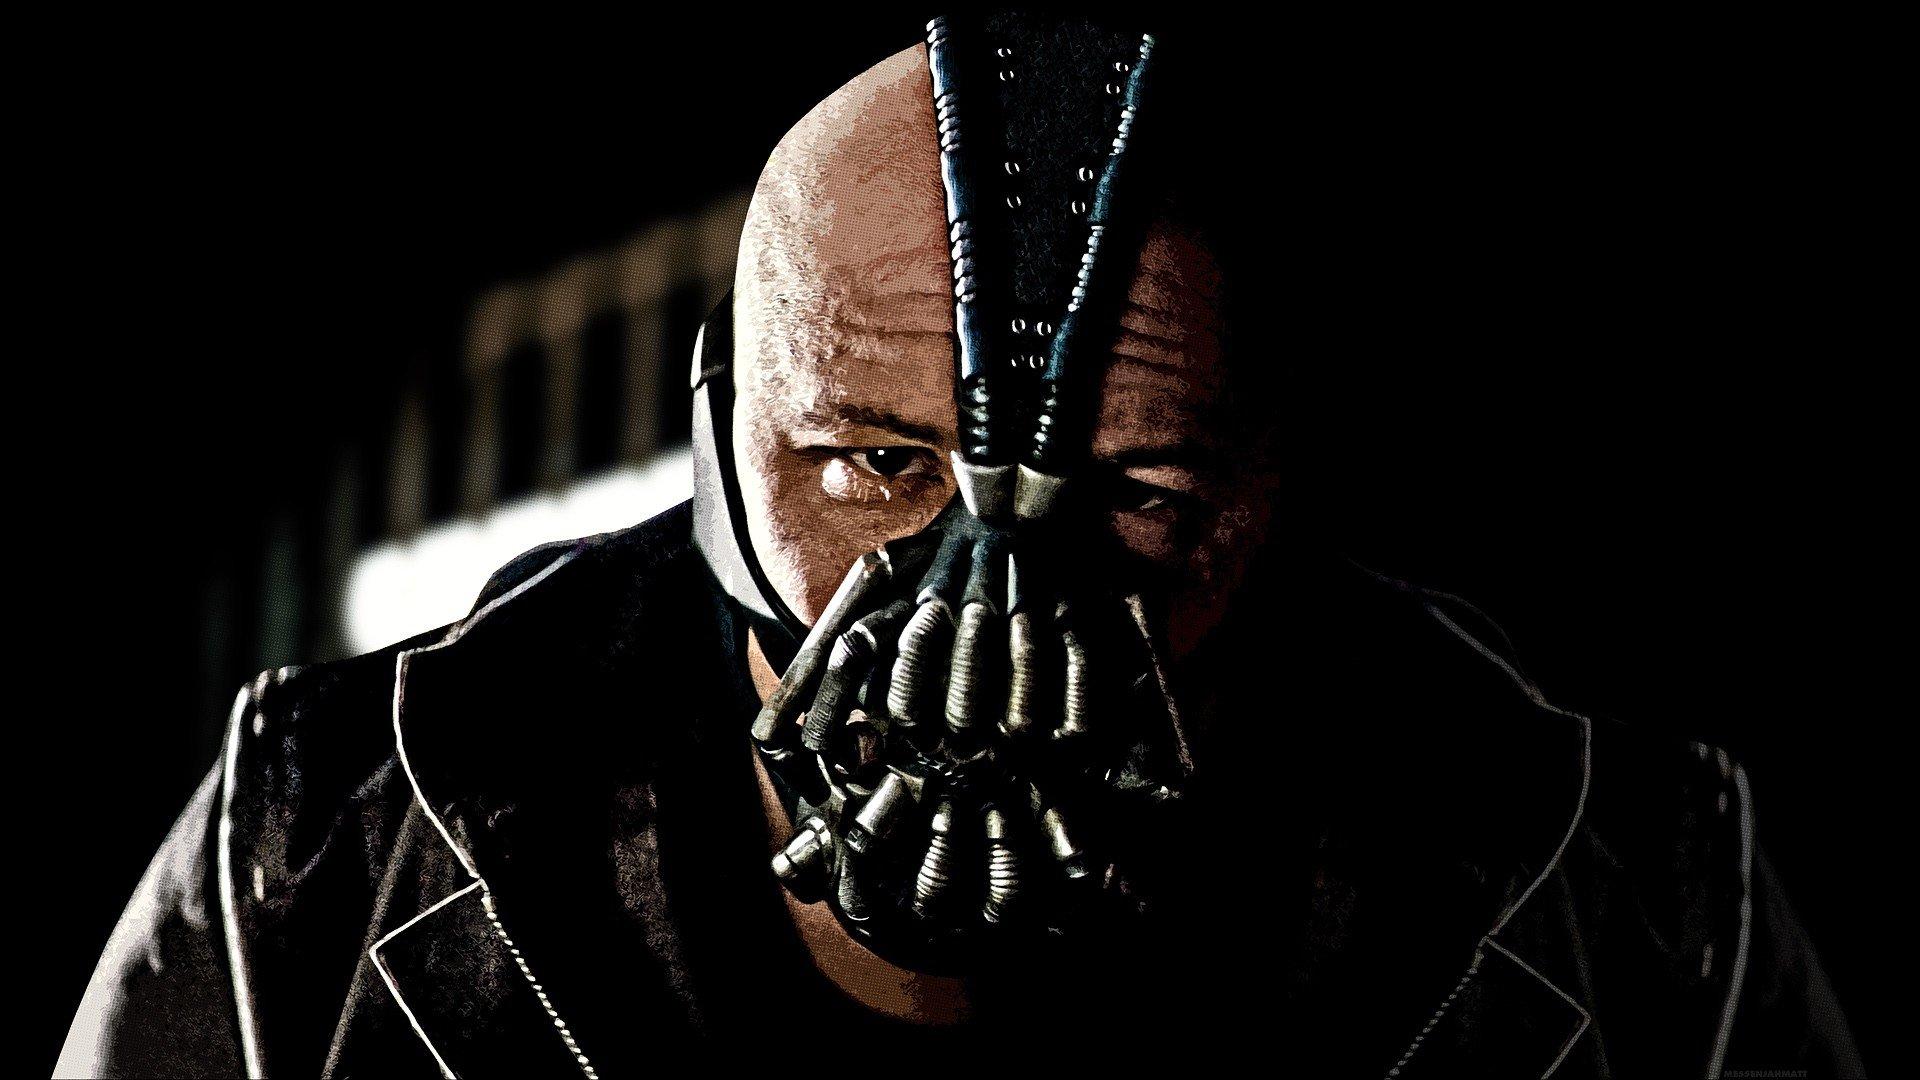 High Resolution The Dark Knight Rises Full Hd Wallpaper - Dark Knight Rises  Bane - 1920x1080 Wallpaper - teahub.io